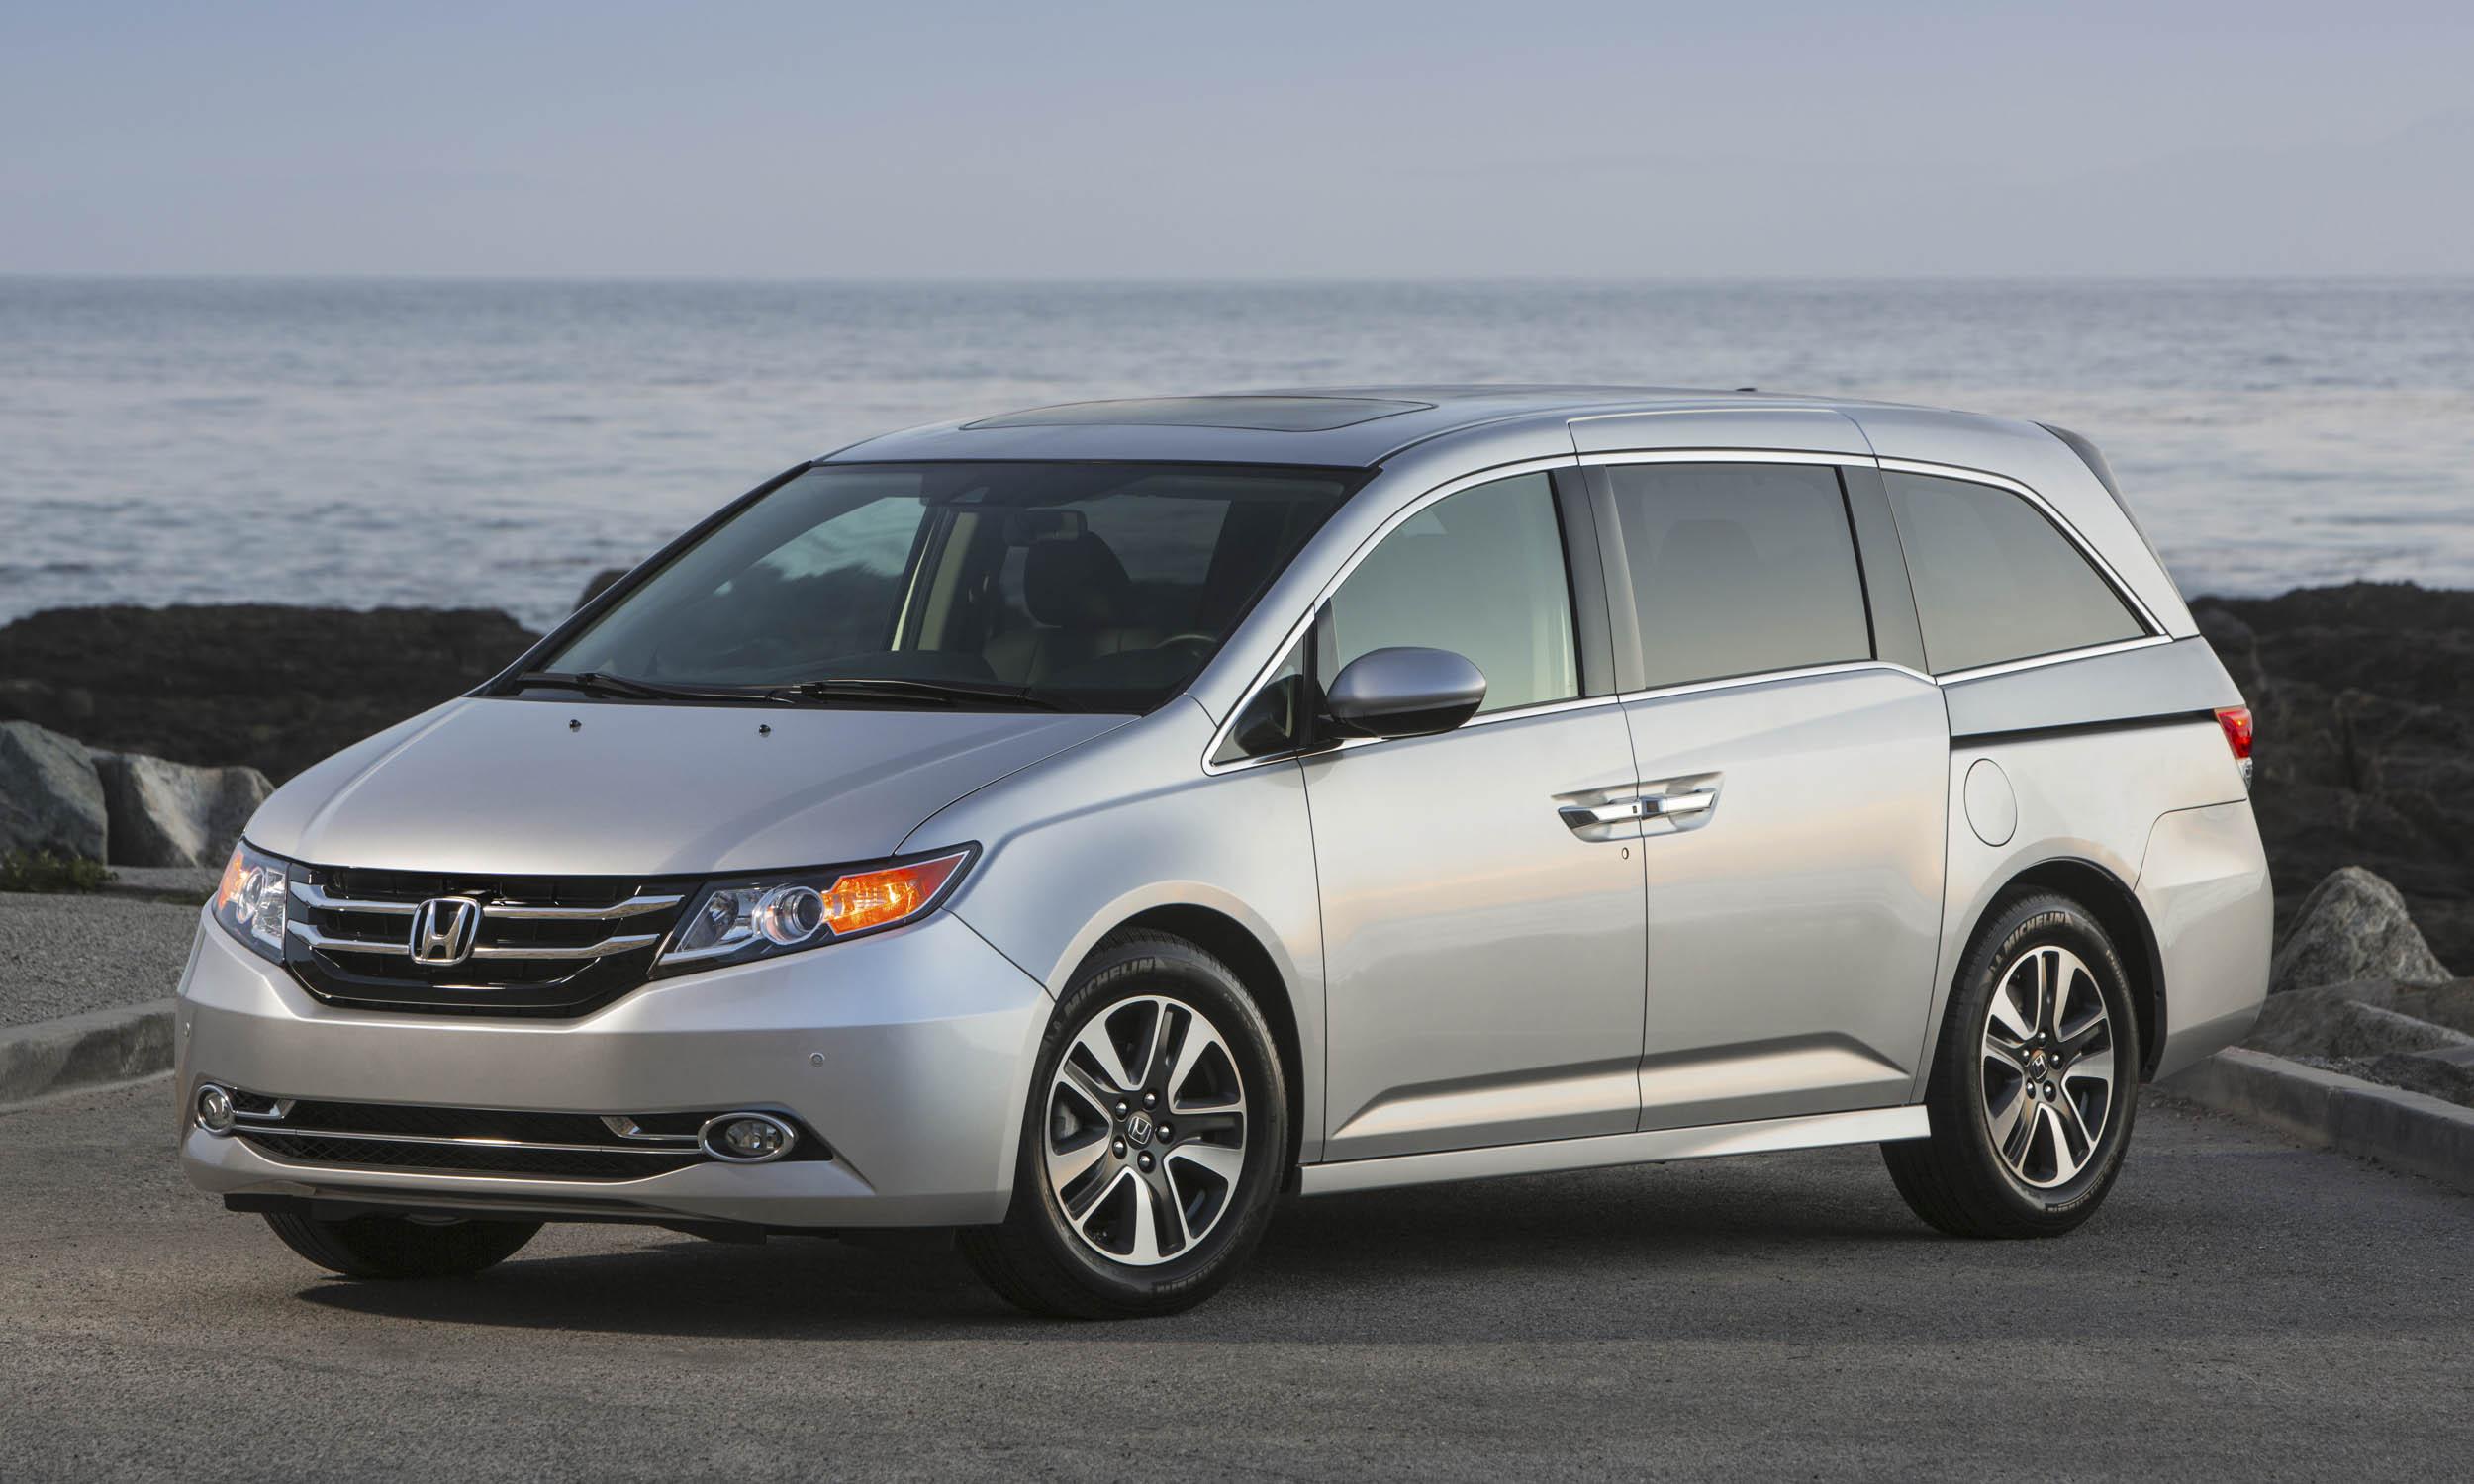 Latest Automotive Safety Recalls Autonxt Honda Pilot Trailer Wiring Harness Melted